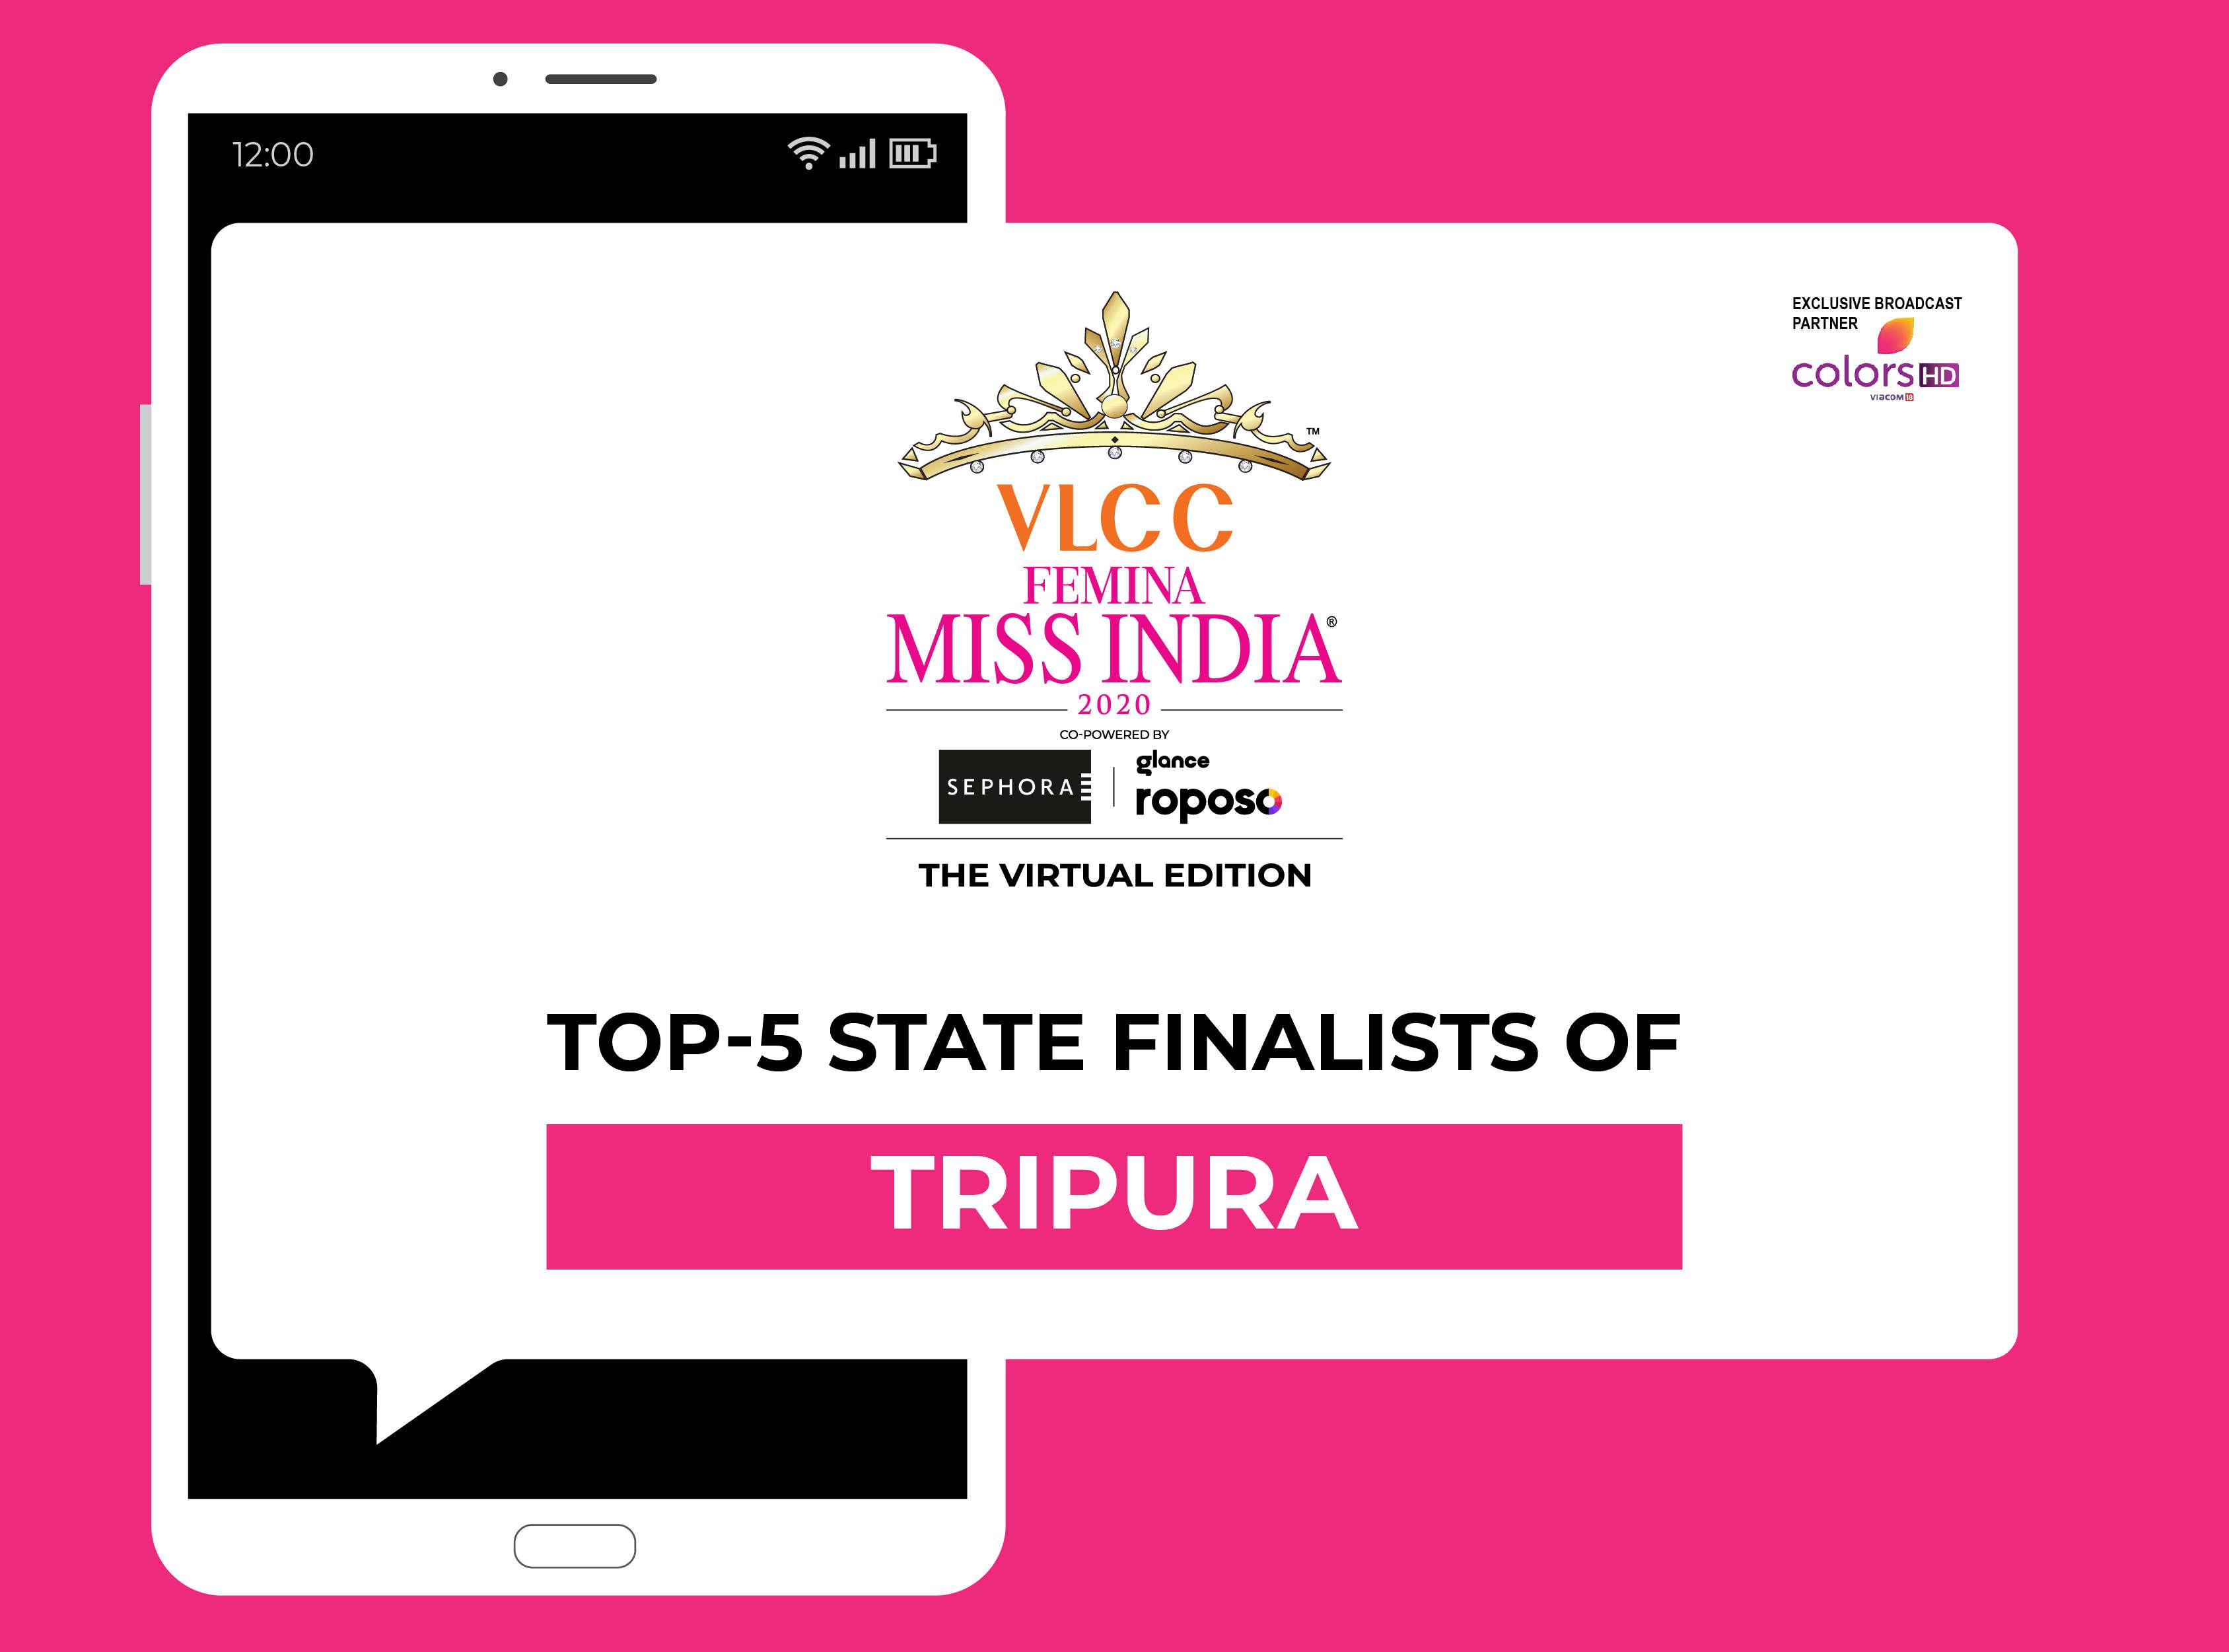 Introducing VLCC Femina Miss India Tripura 2020 Finalists!